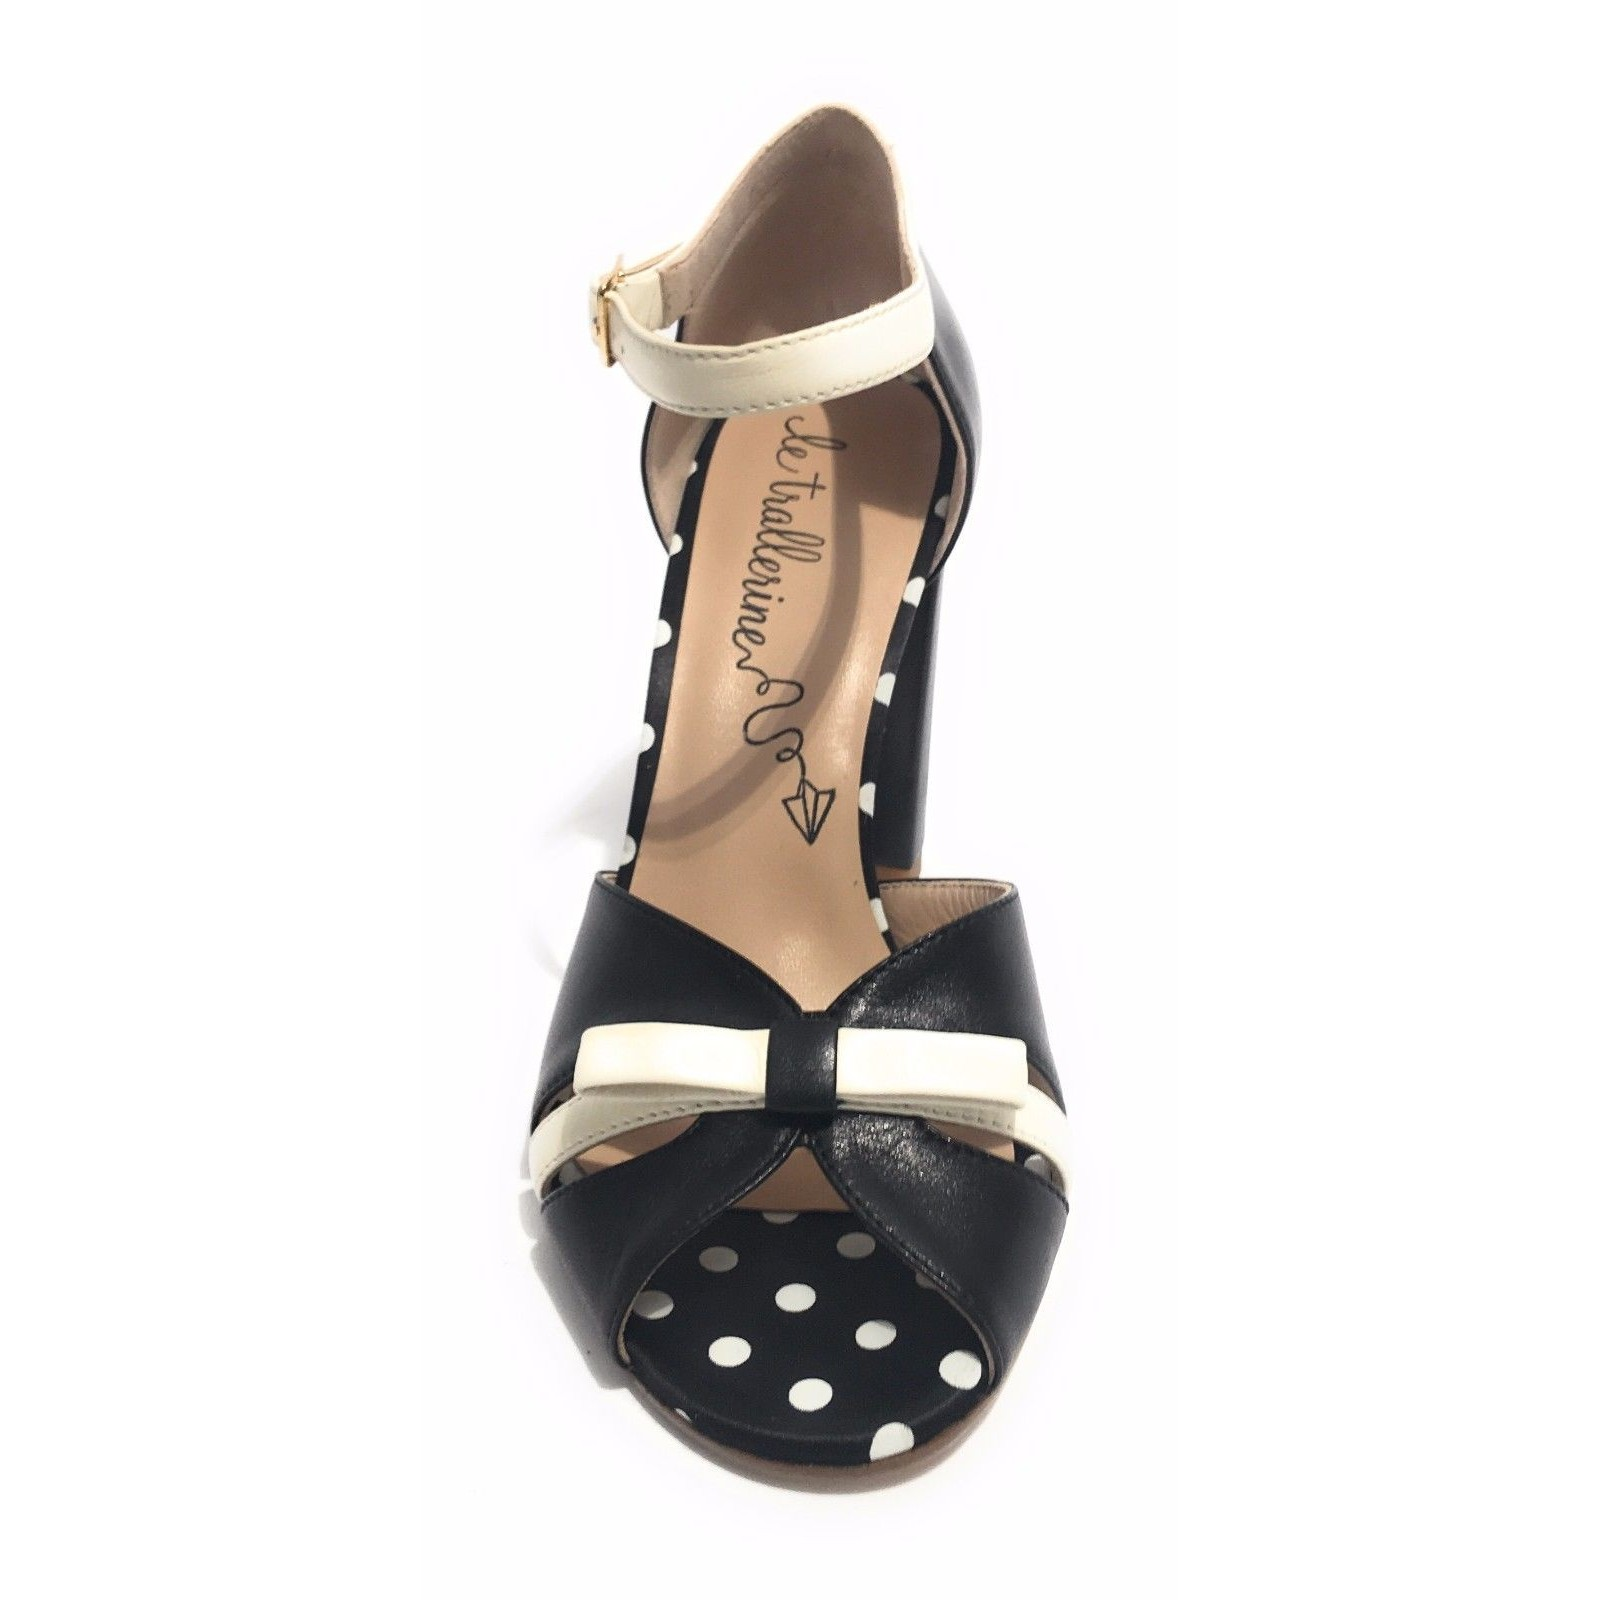 Panna Le Donna Ztxirx1 80 Scarpe Tc Sandalo Artigianale Trallerine Black XTikOPZu